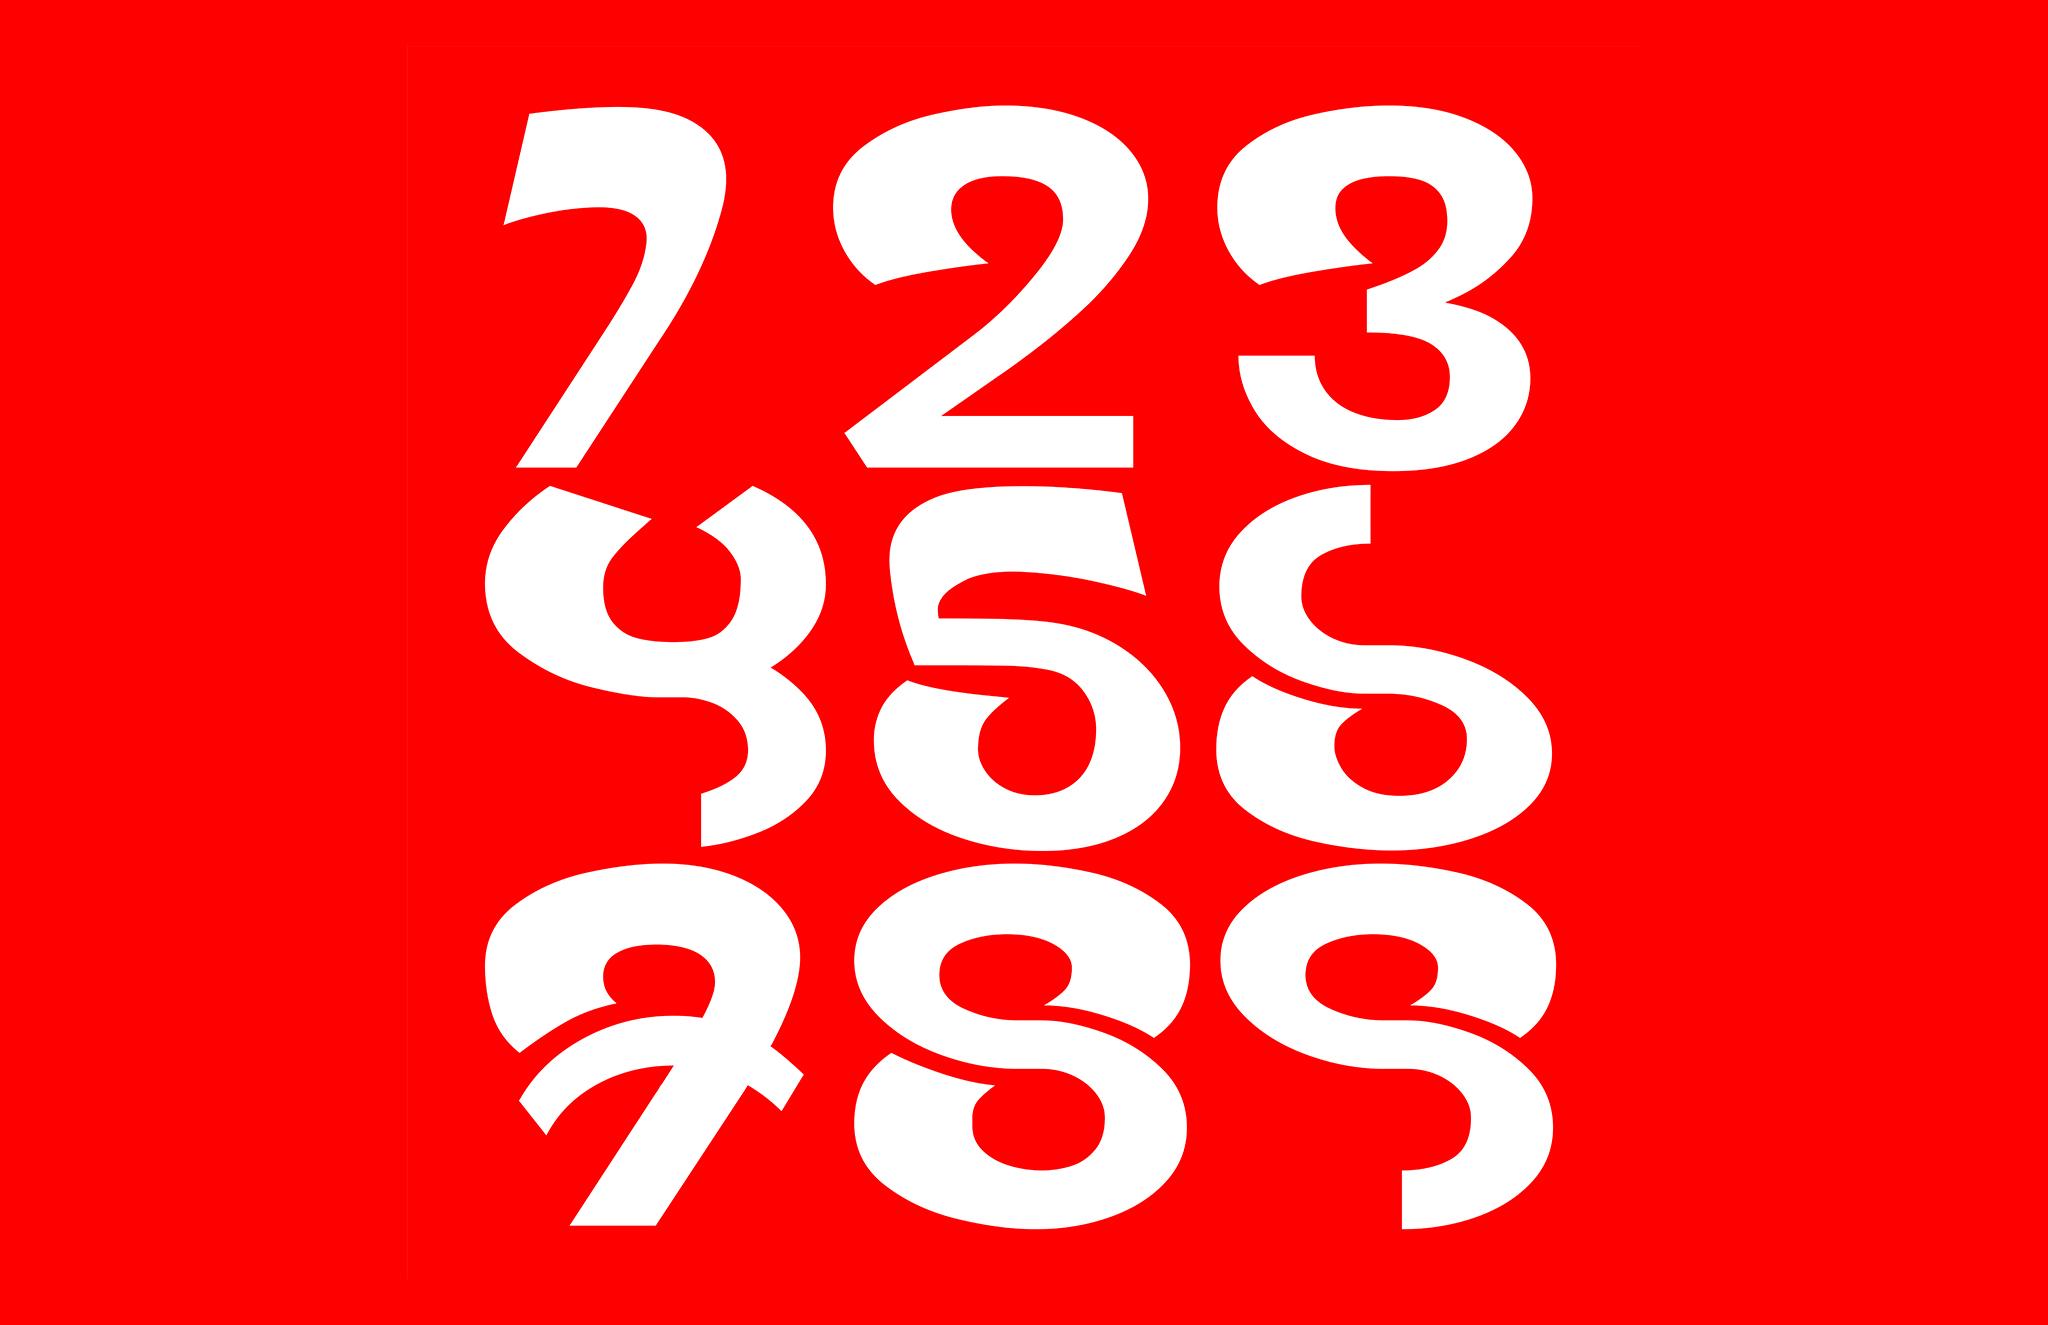 Wabla Typeface Numbers